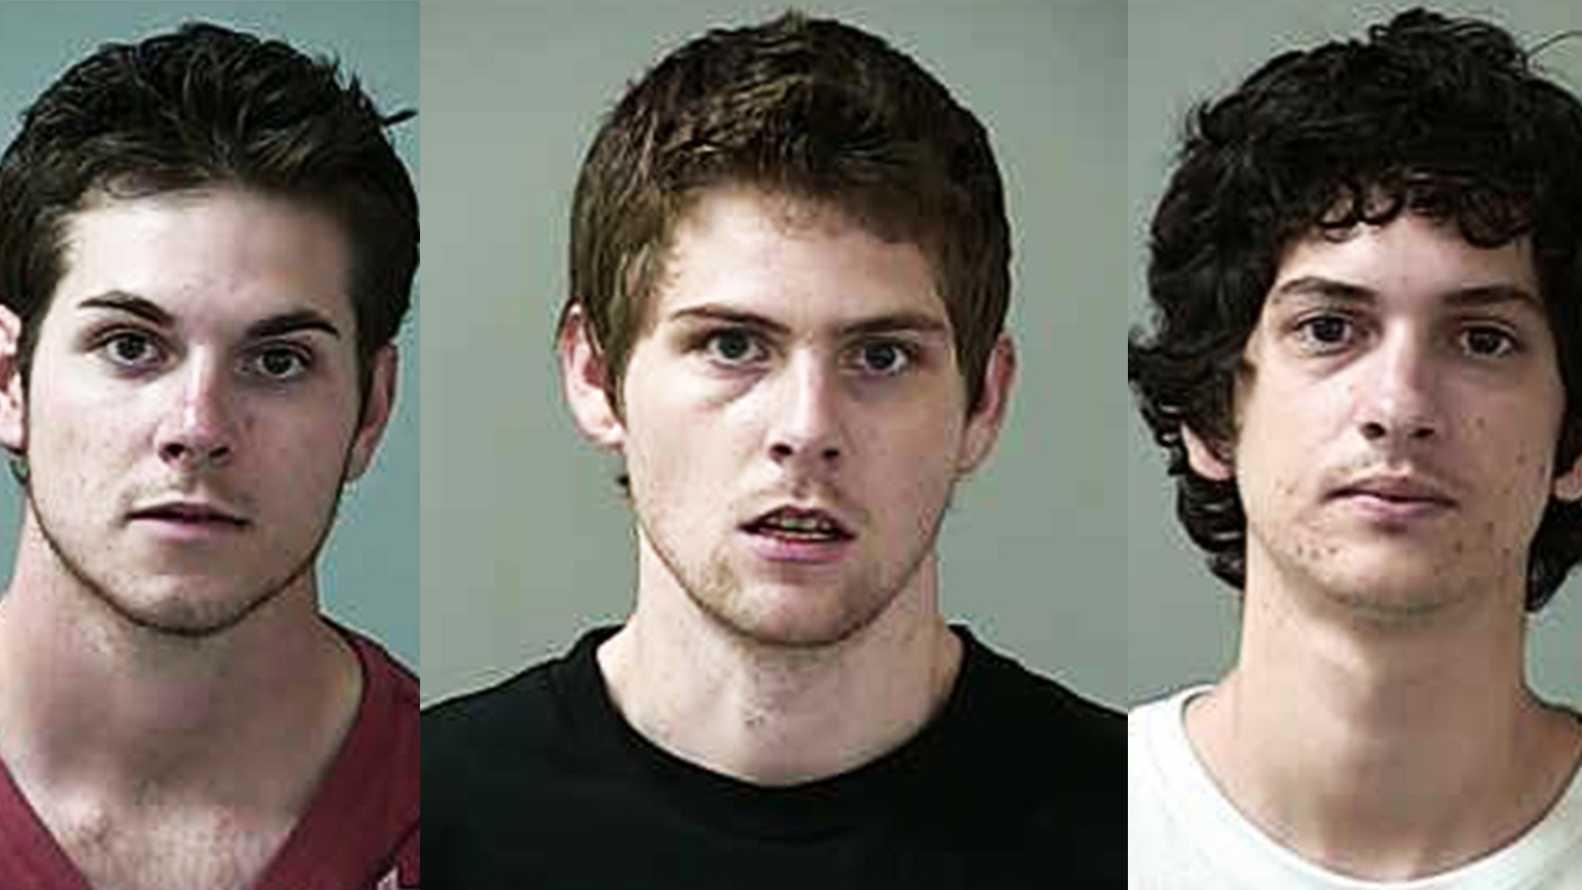 Jason Methot, left, Nicolas Cooper, center, and Anthony Rangel were arrested on Highway 101 near Highway 85.